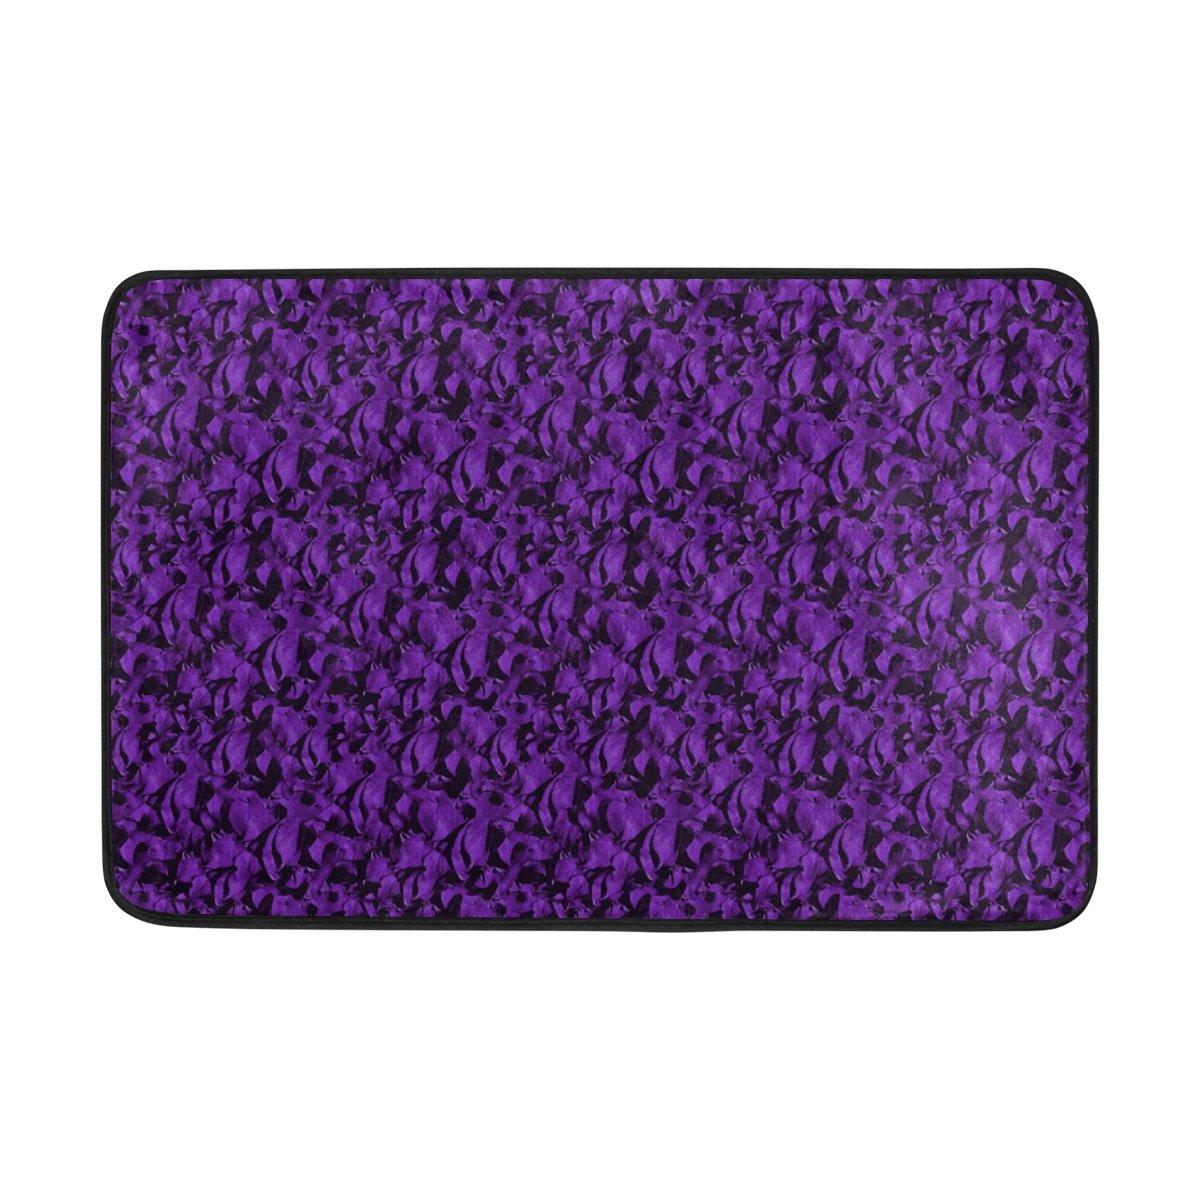 ALAZA Aero Colorful Purple Doormat Indoor/Outdoor Washable Garden Office Door Mat,Kitchen Dining Living Hallway Bathroom Pet Entry Rugs with Non Slip Backing by ALAZA